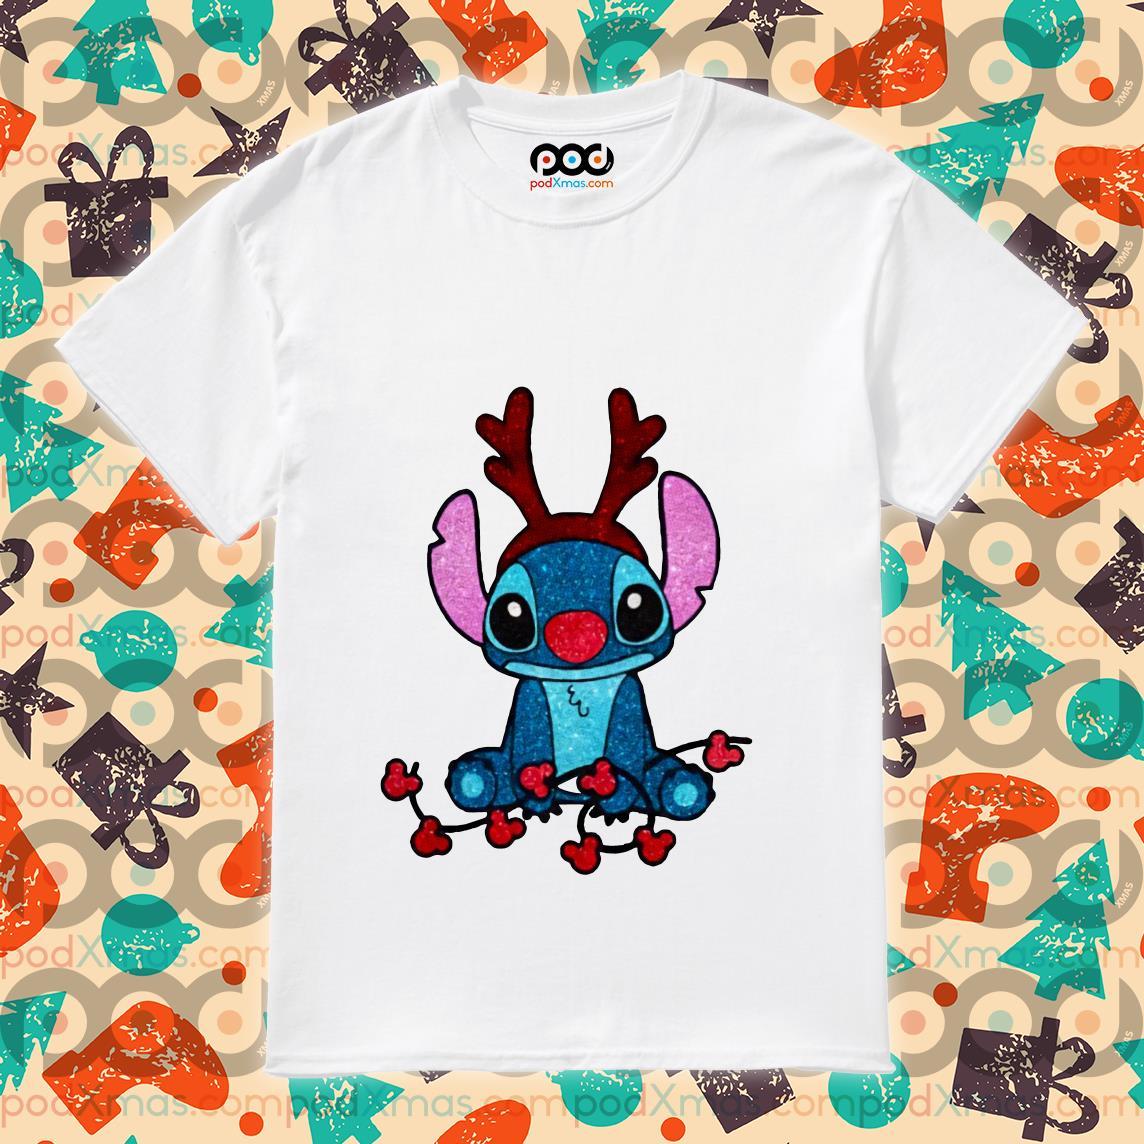 Stitch Reindeer Christmas shirt